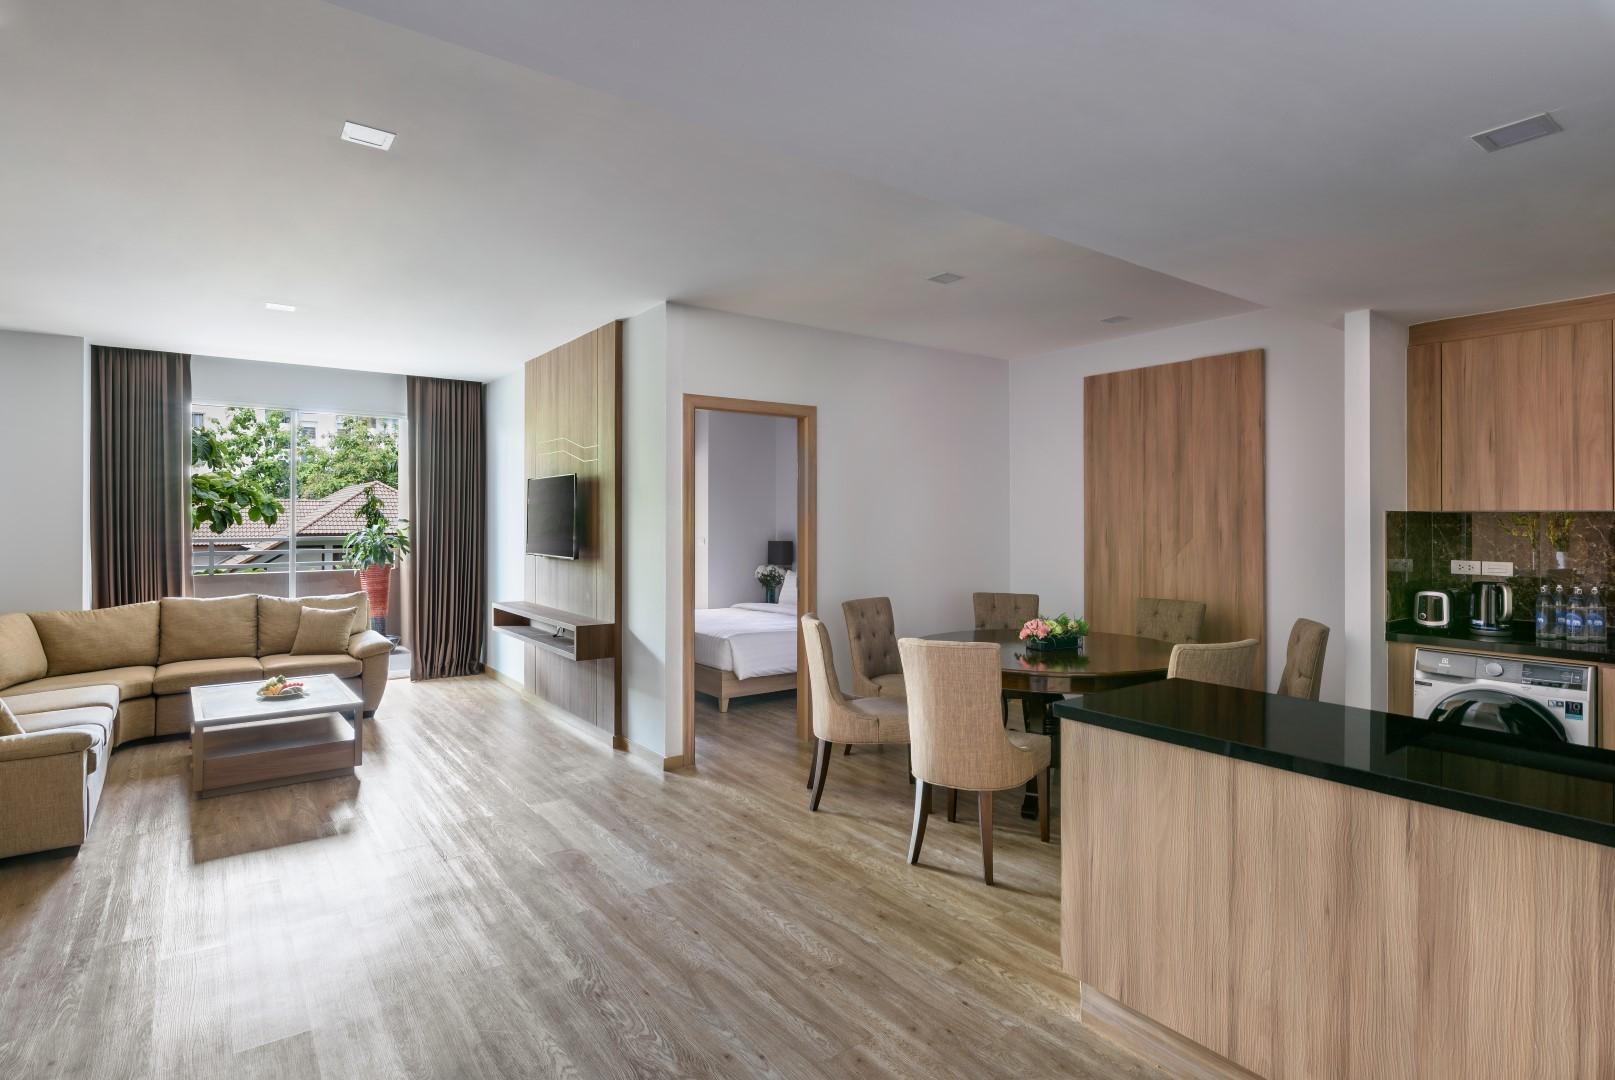 201907 Adelphi Grande Sukhumvit Hotel - Room 401 Living Area and Dining Area (Large).jpg